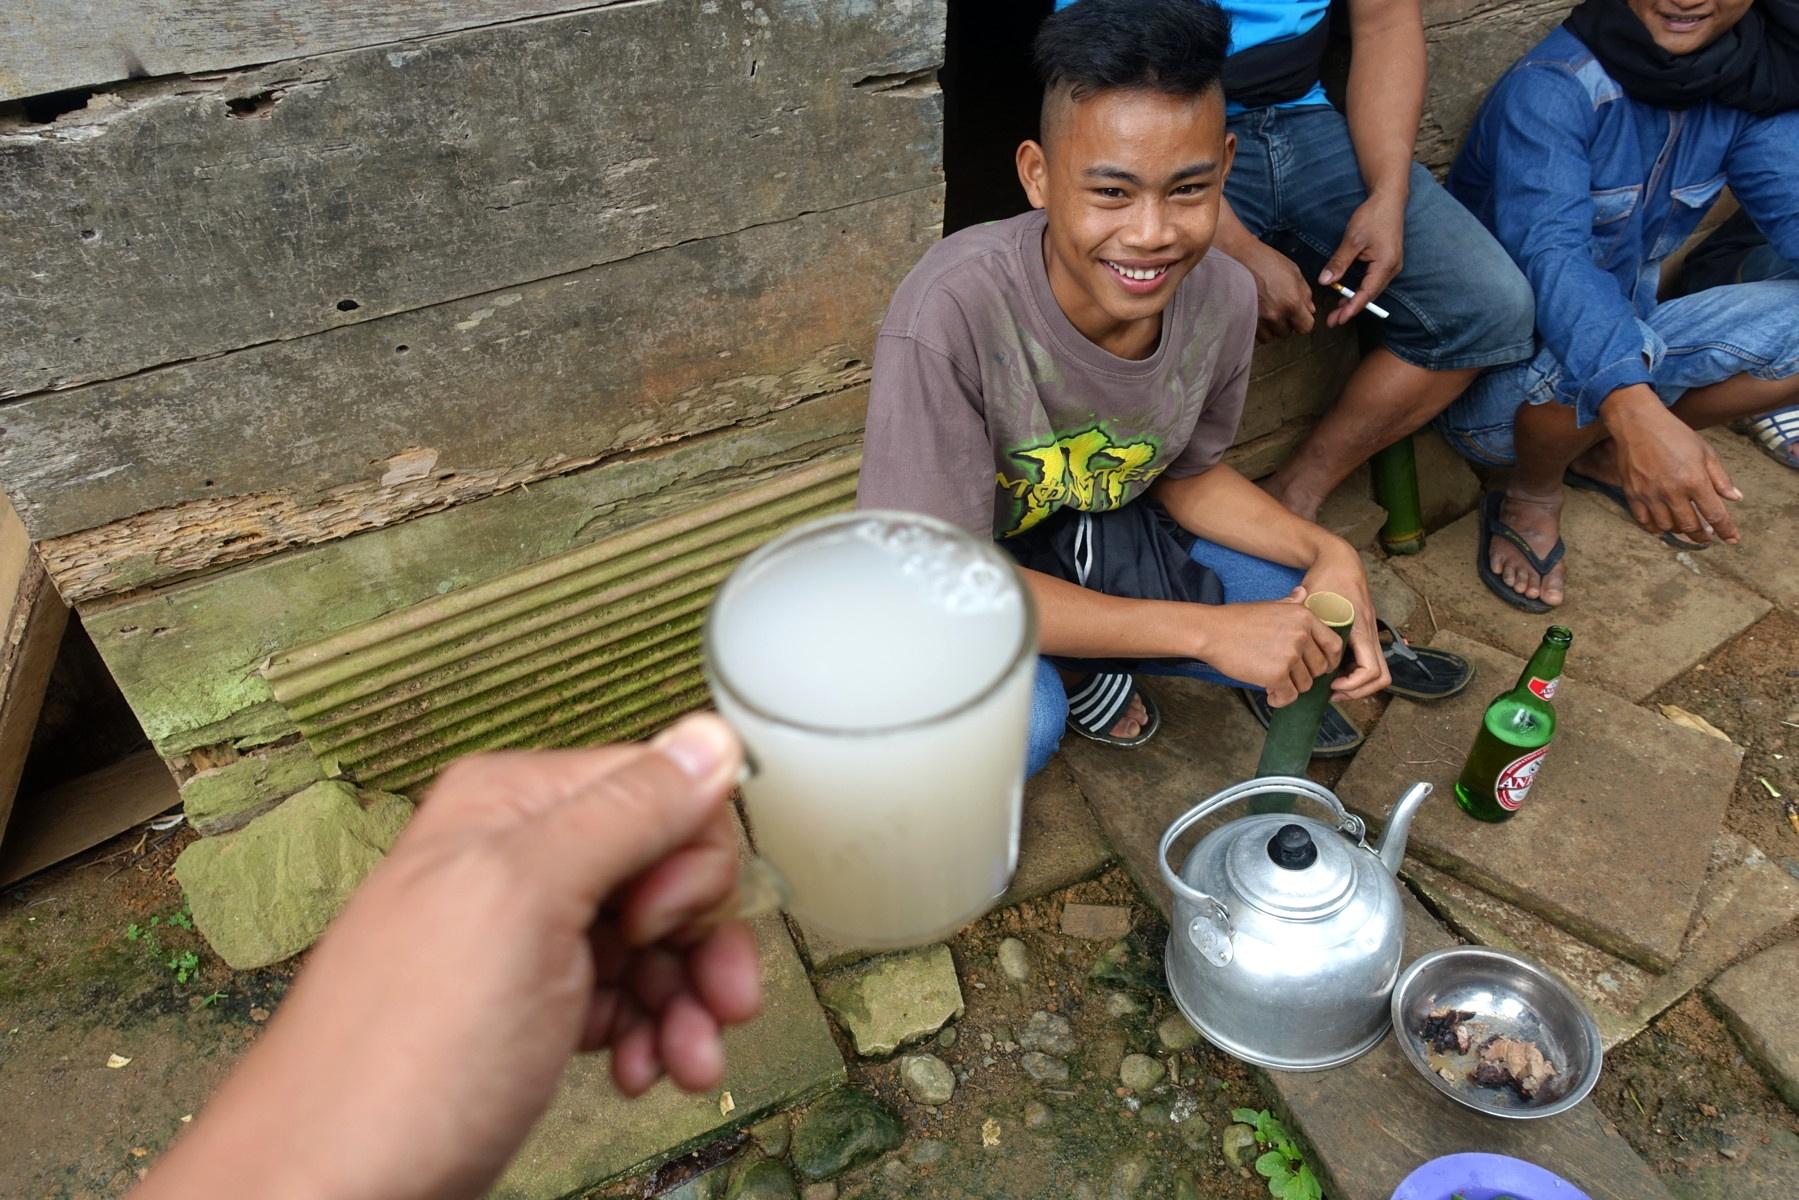 Indonesie_Sulawesi_Toraja_Rantepao DSC04747